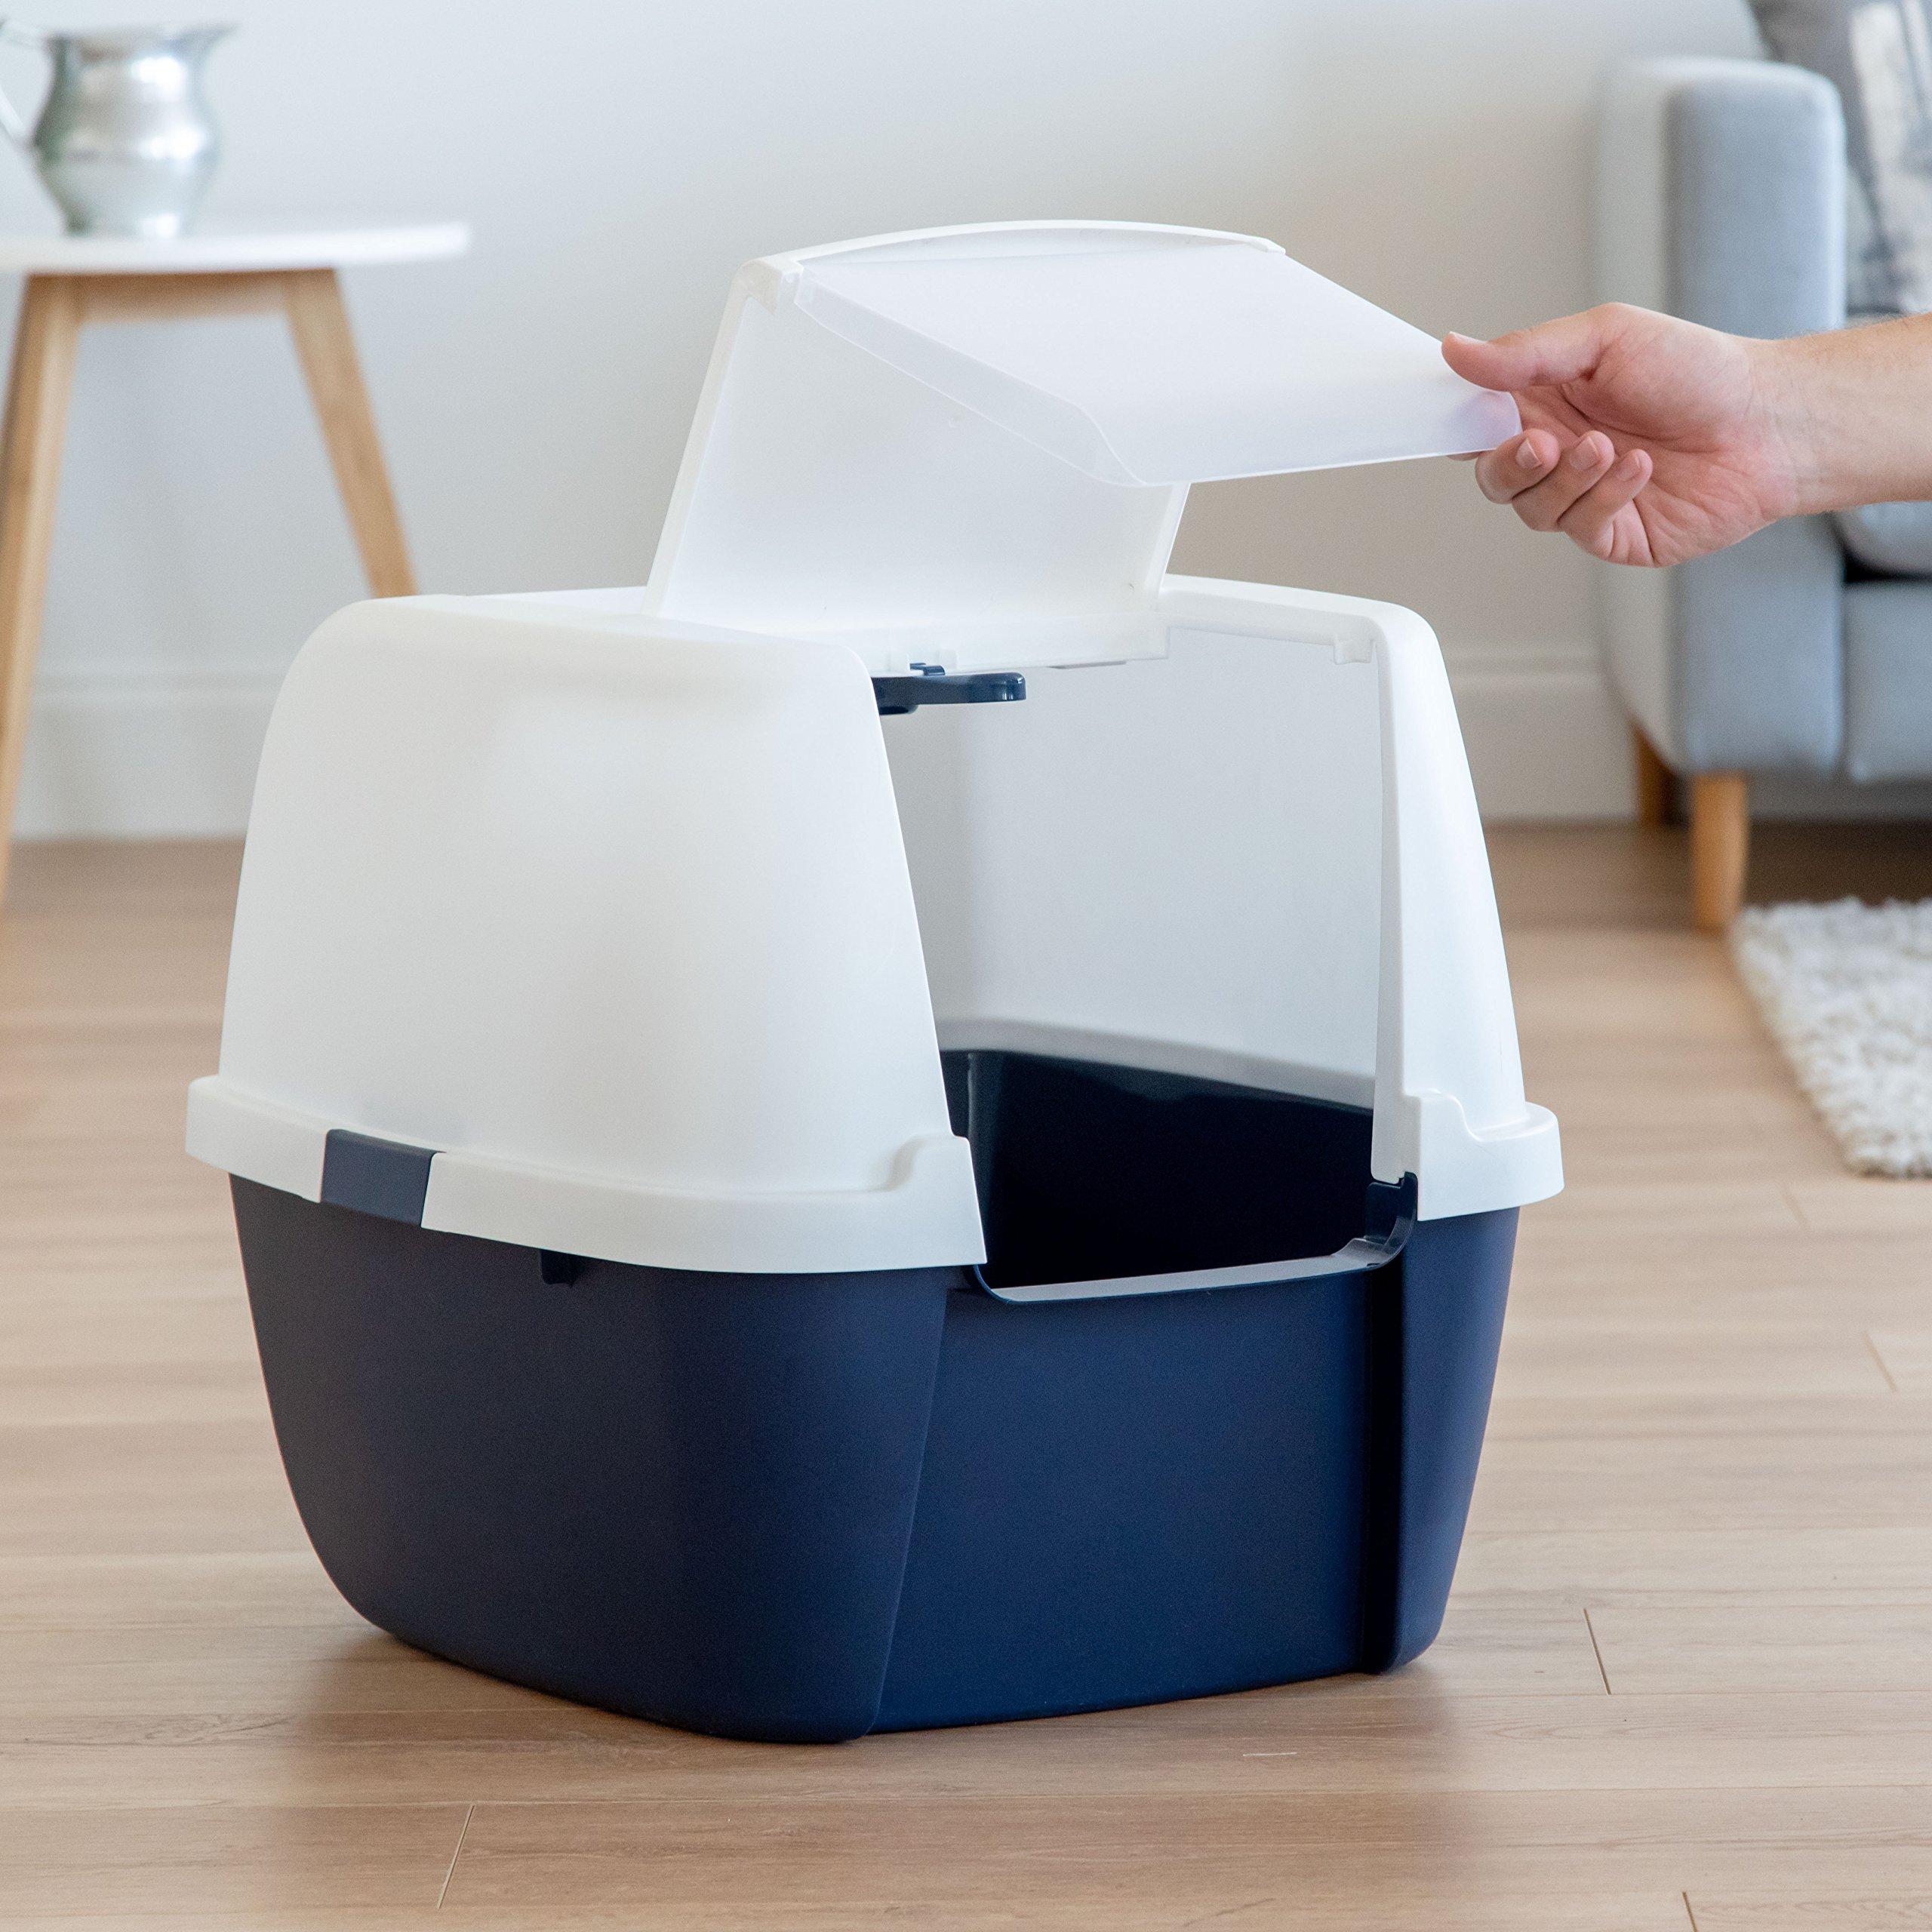 IRIS Jumbo Hooded Litter Box with Scoop, Navy by IRIS USA, Inc. (Image #4)